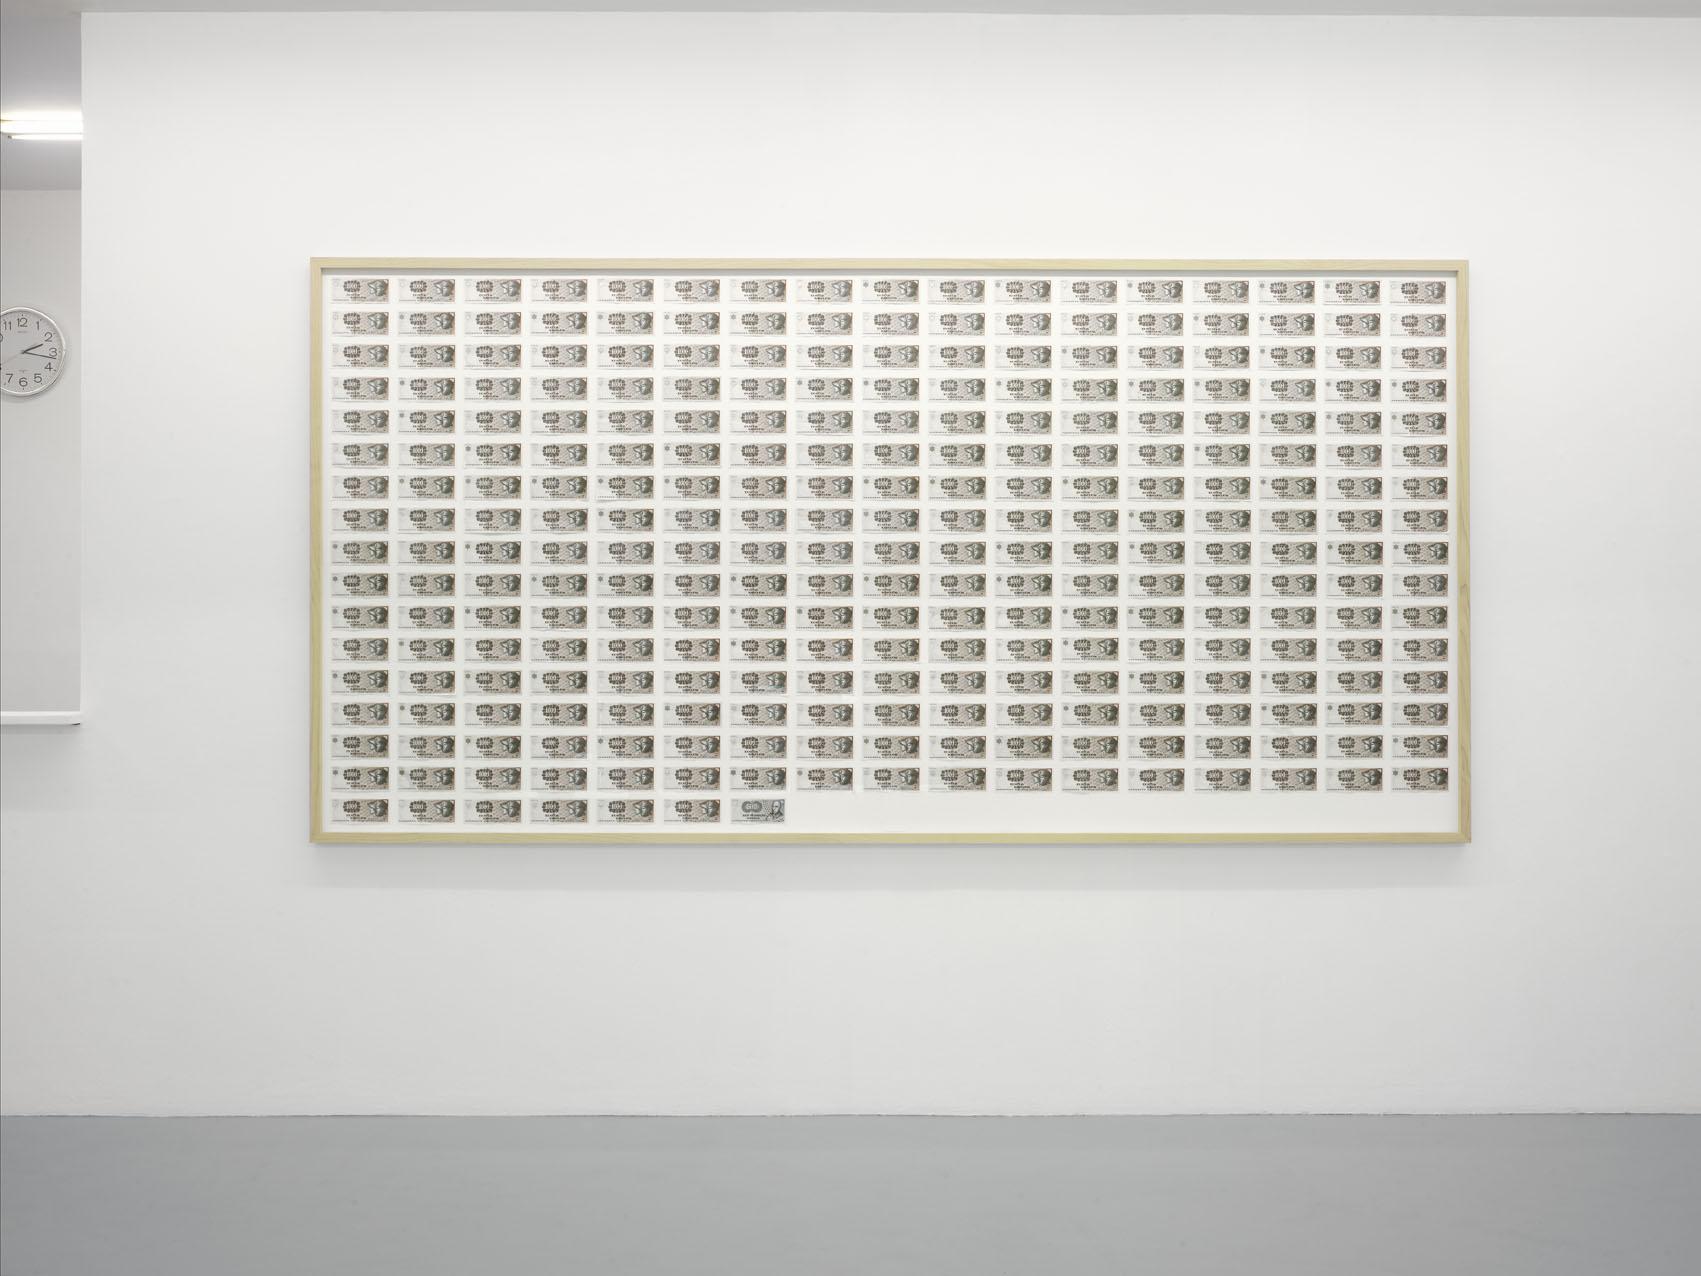 321945